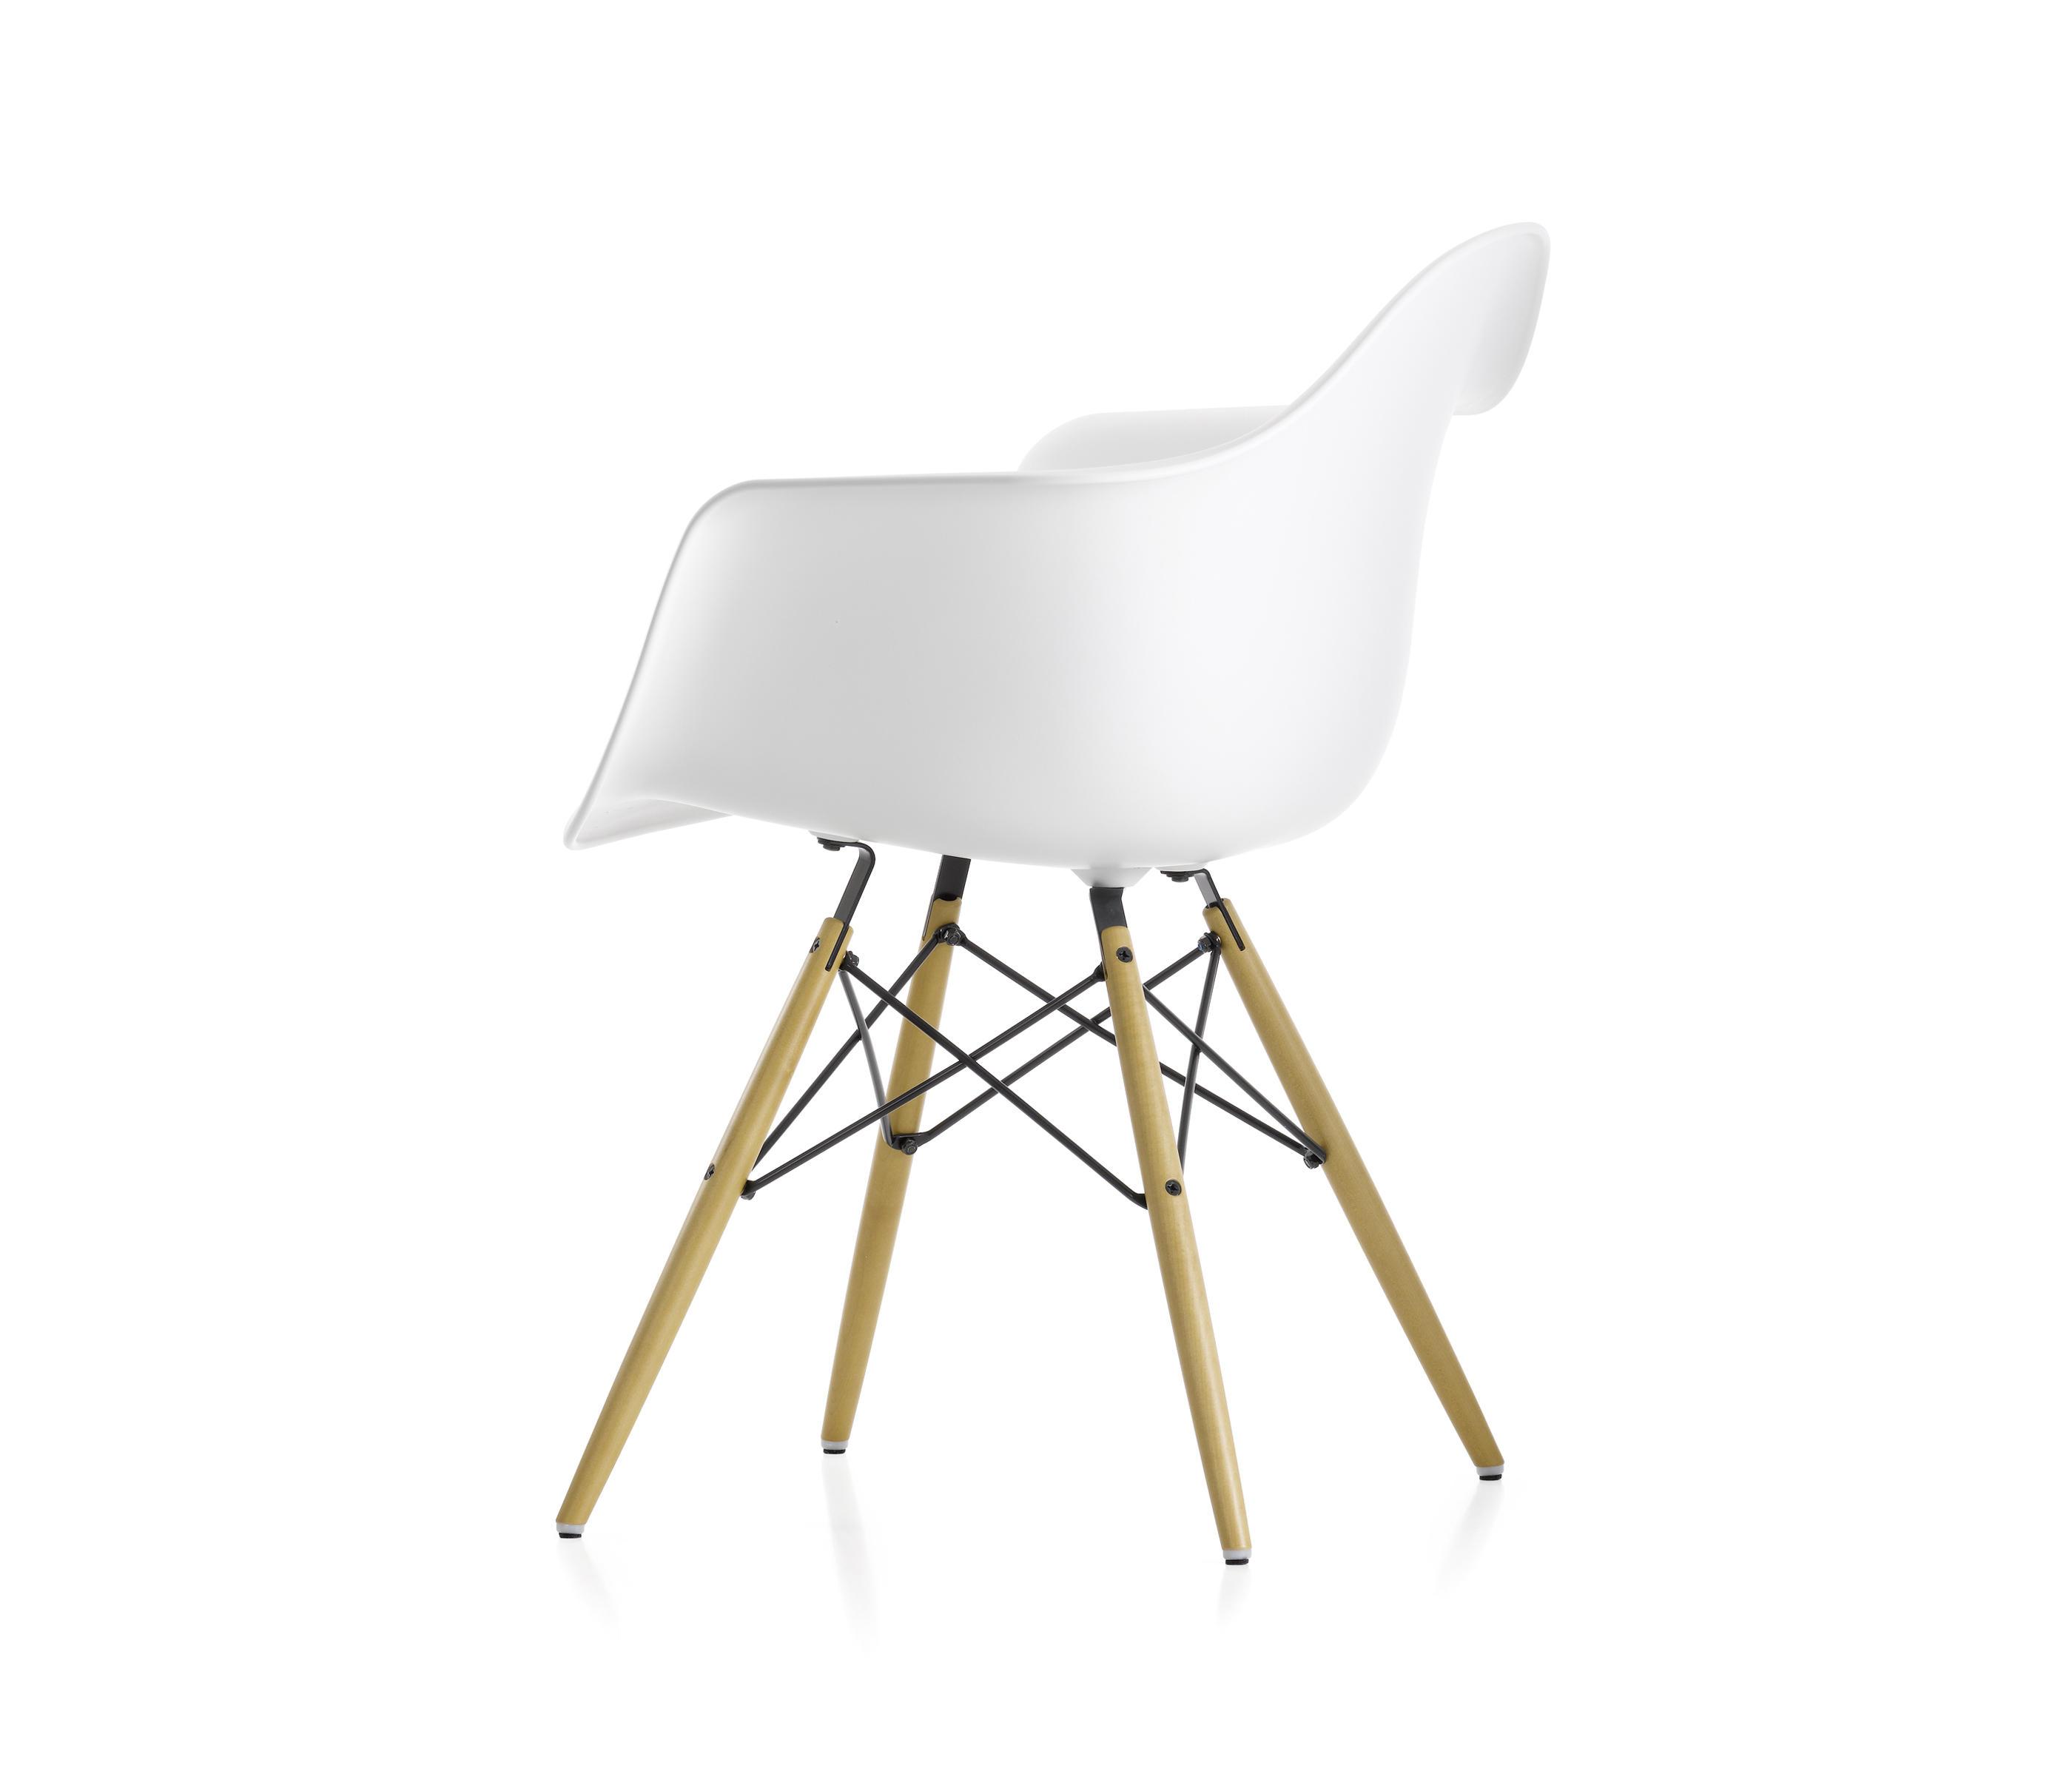 Eames Plastic Armchair Daw Chaises De Vitra Architonic